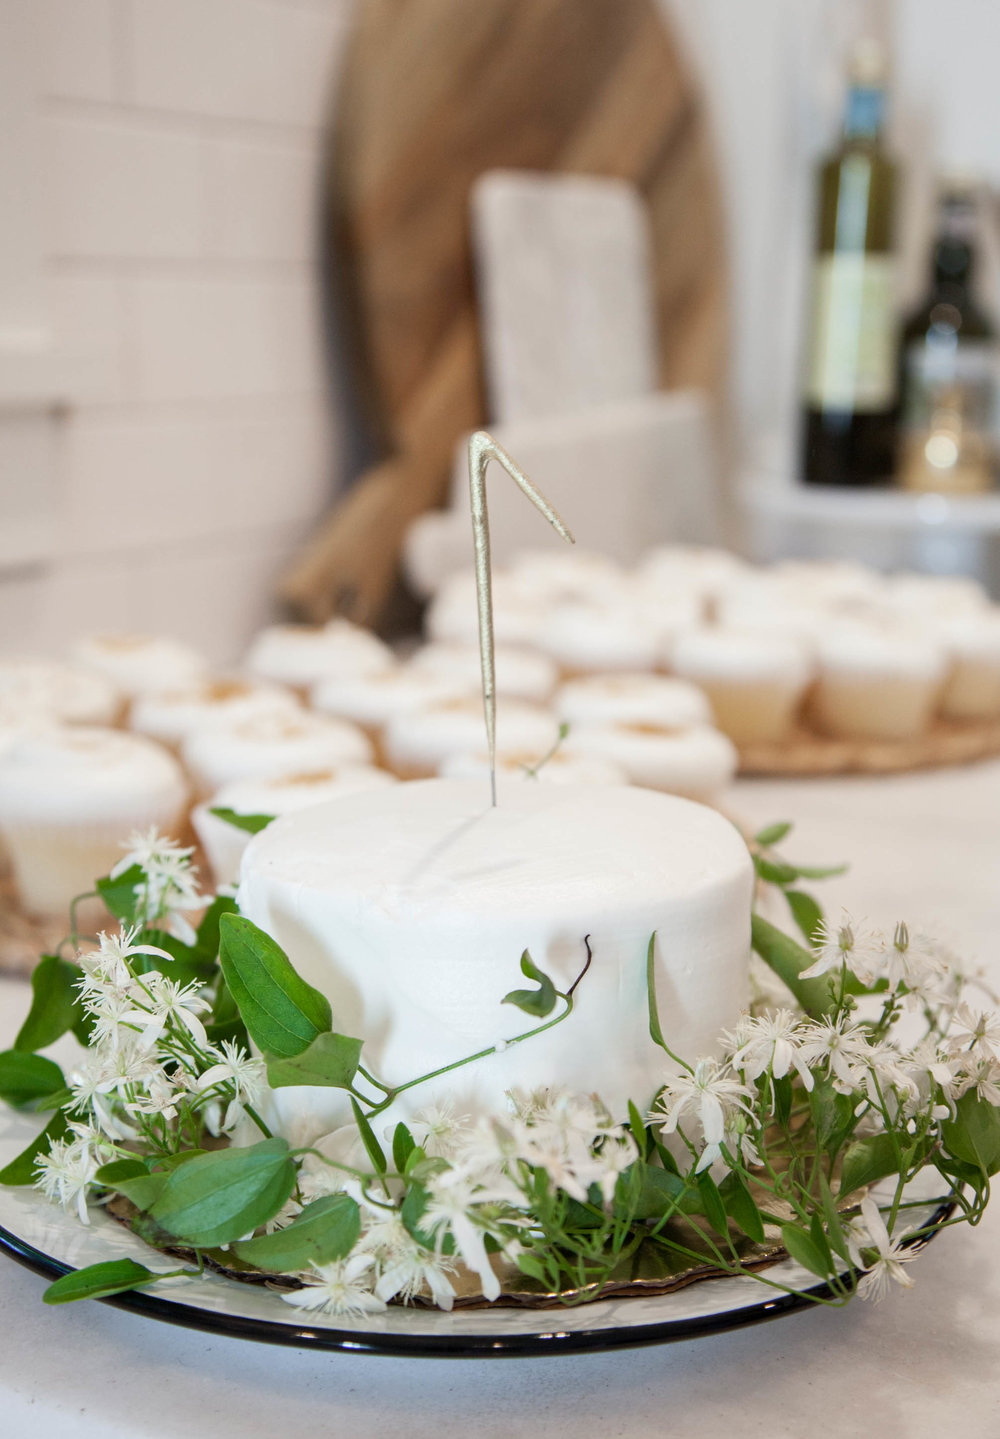 12th-Table-WEDDING-RENTALS-NASHVILLE-Design-Tips-Events-ENTERTAINING-HowIHost-Nashville-Petaja-Birthday-Photograph #-85.jpg